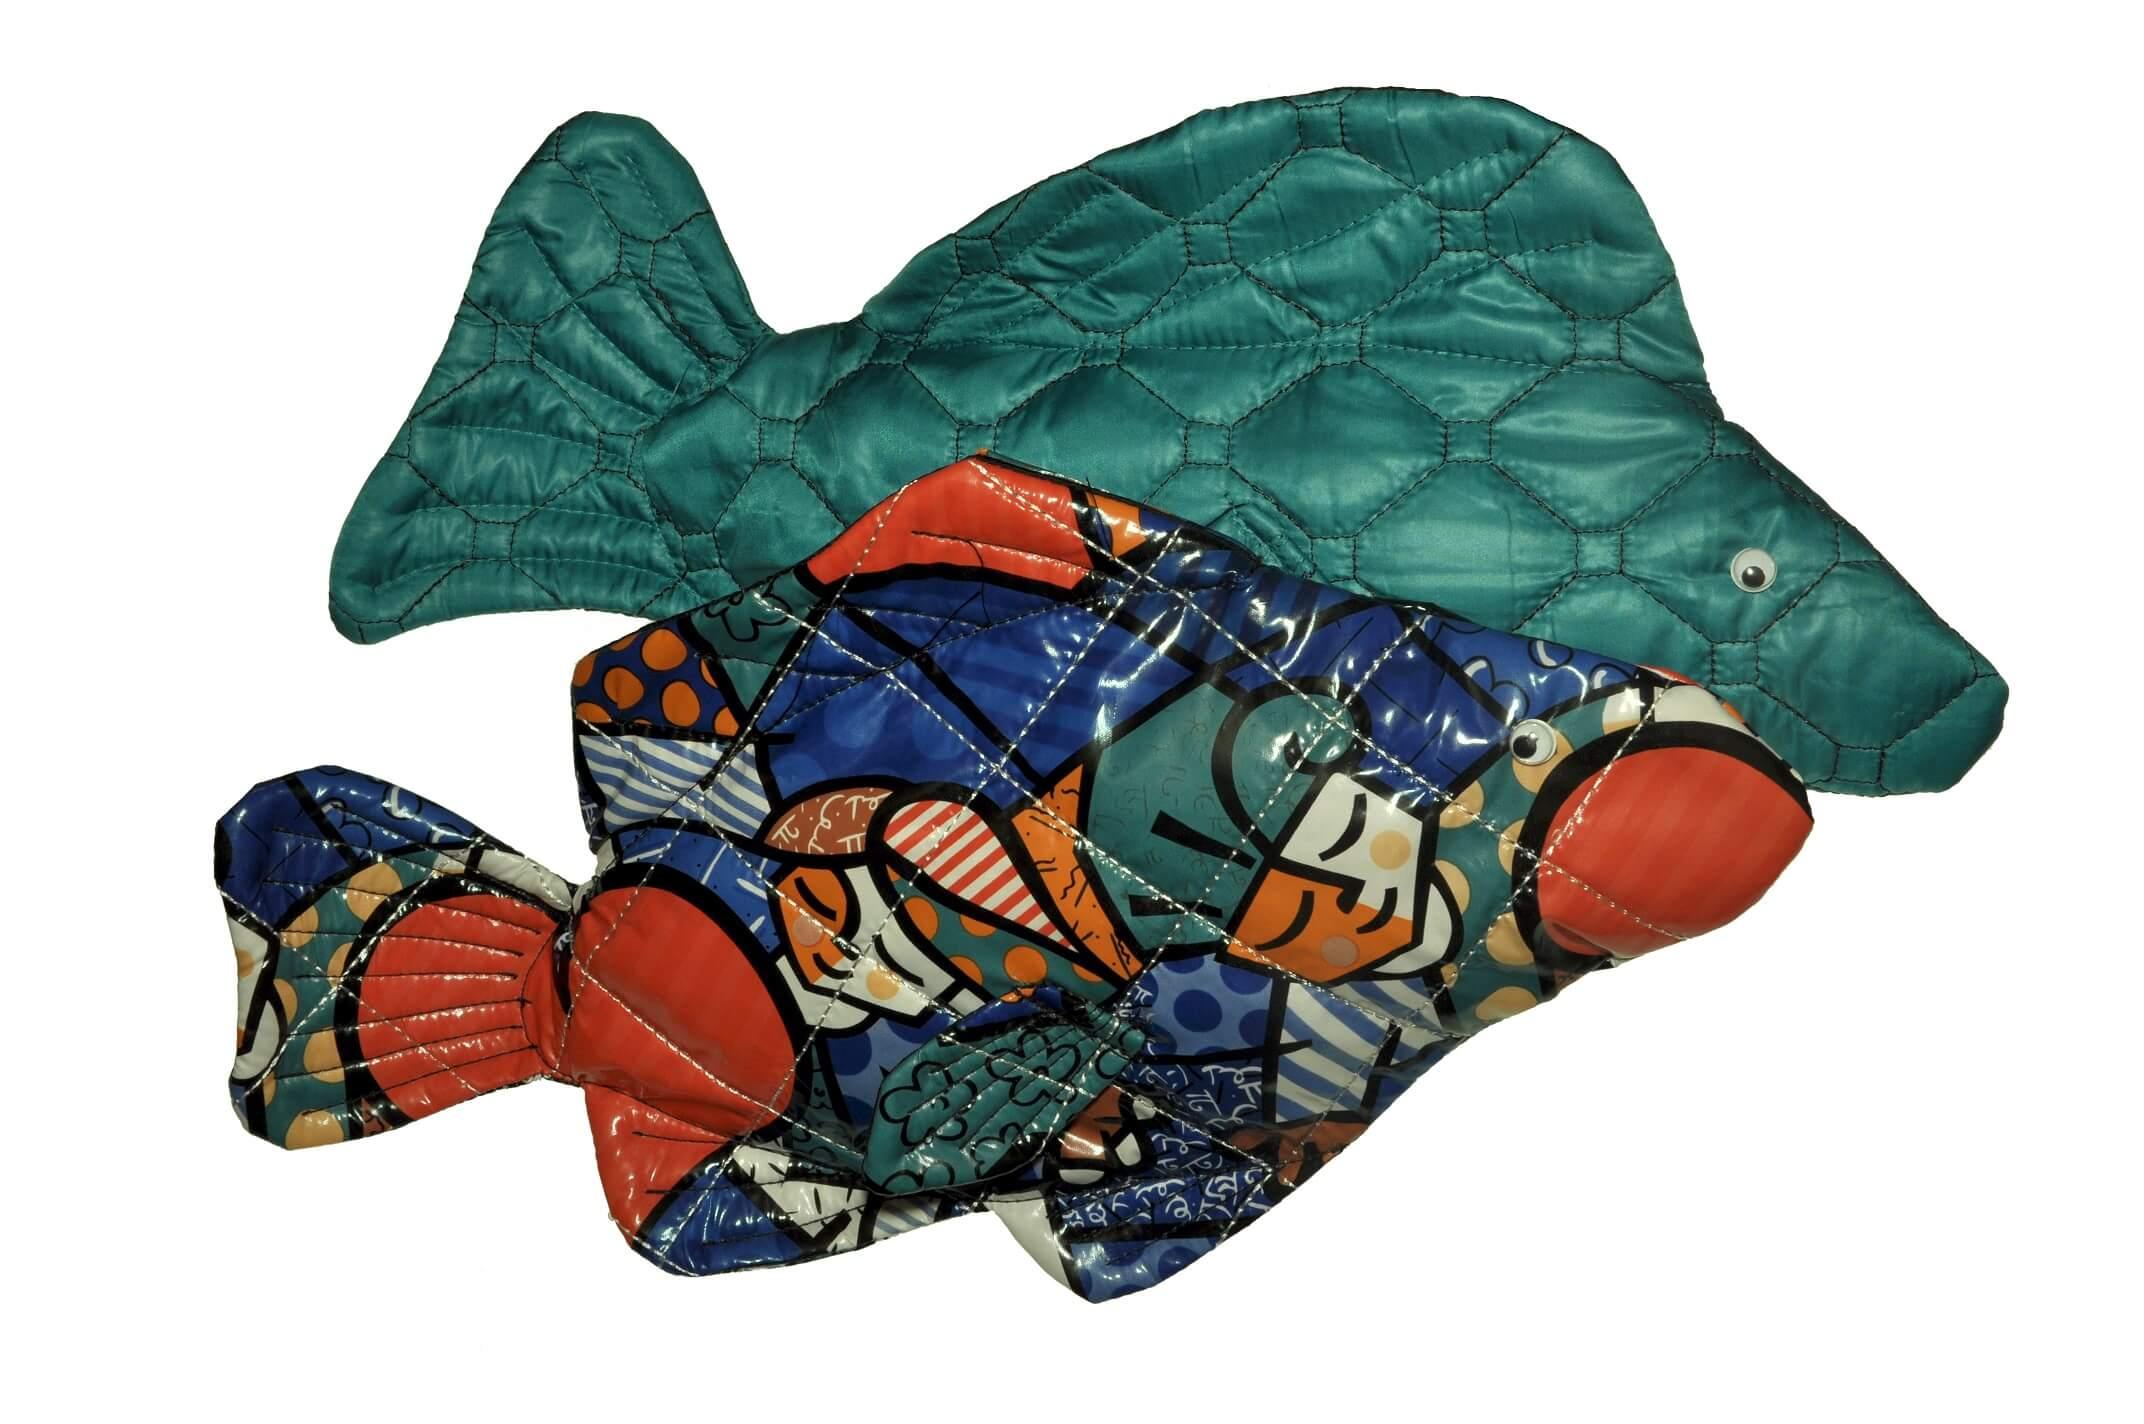 Fish your bag